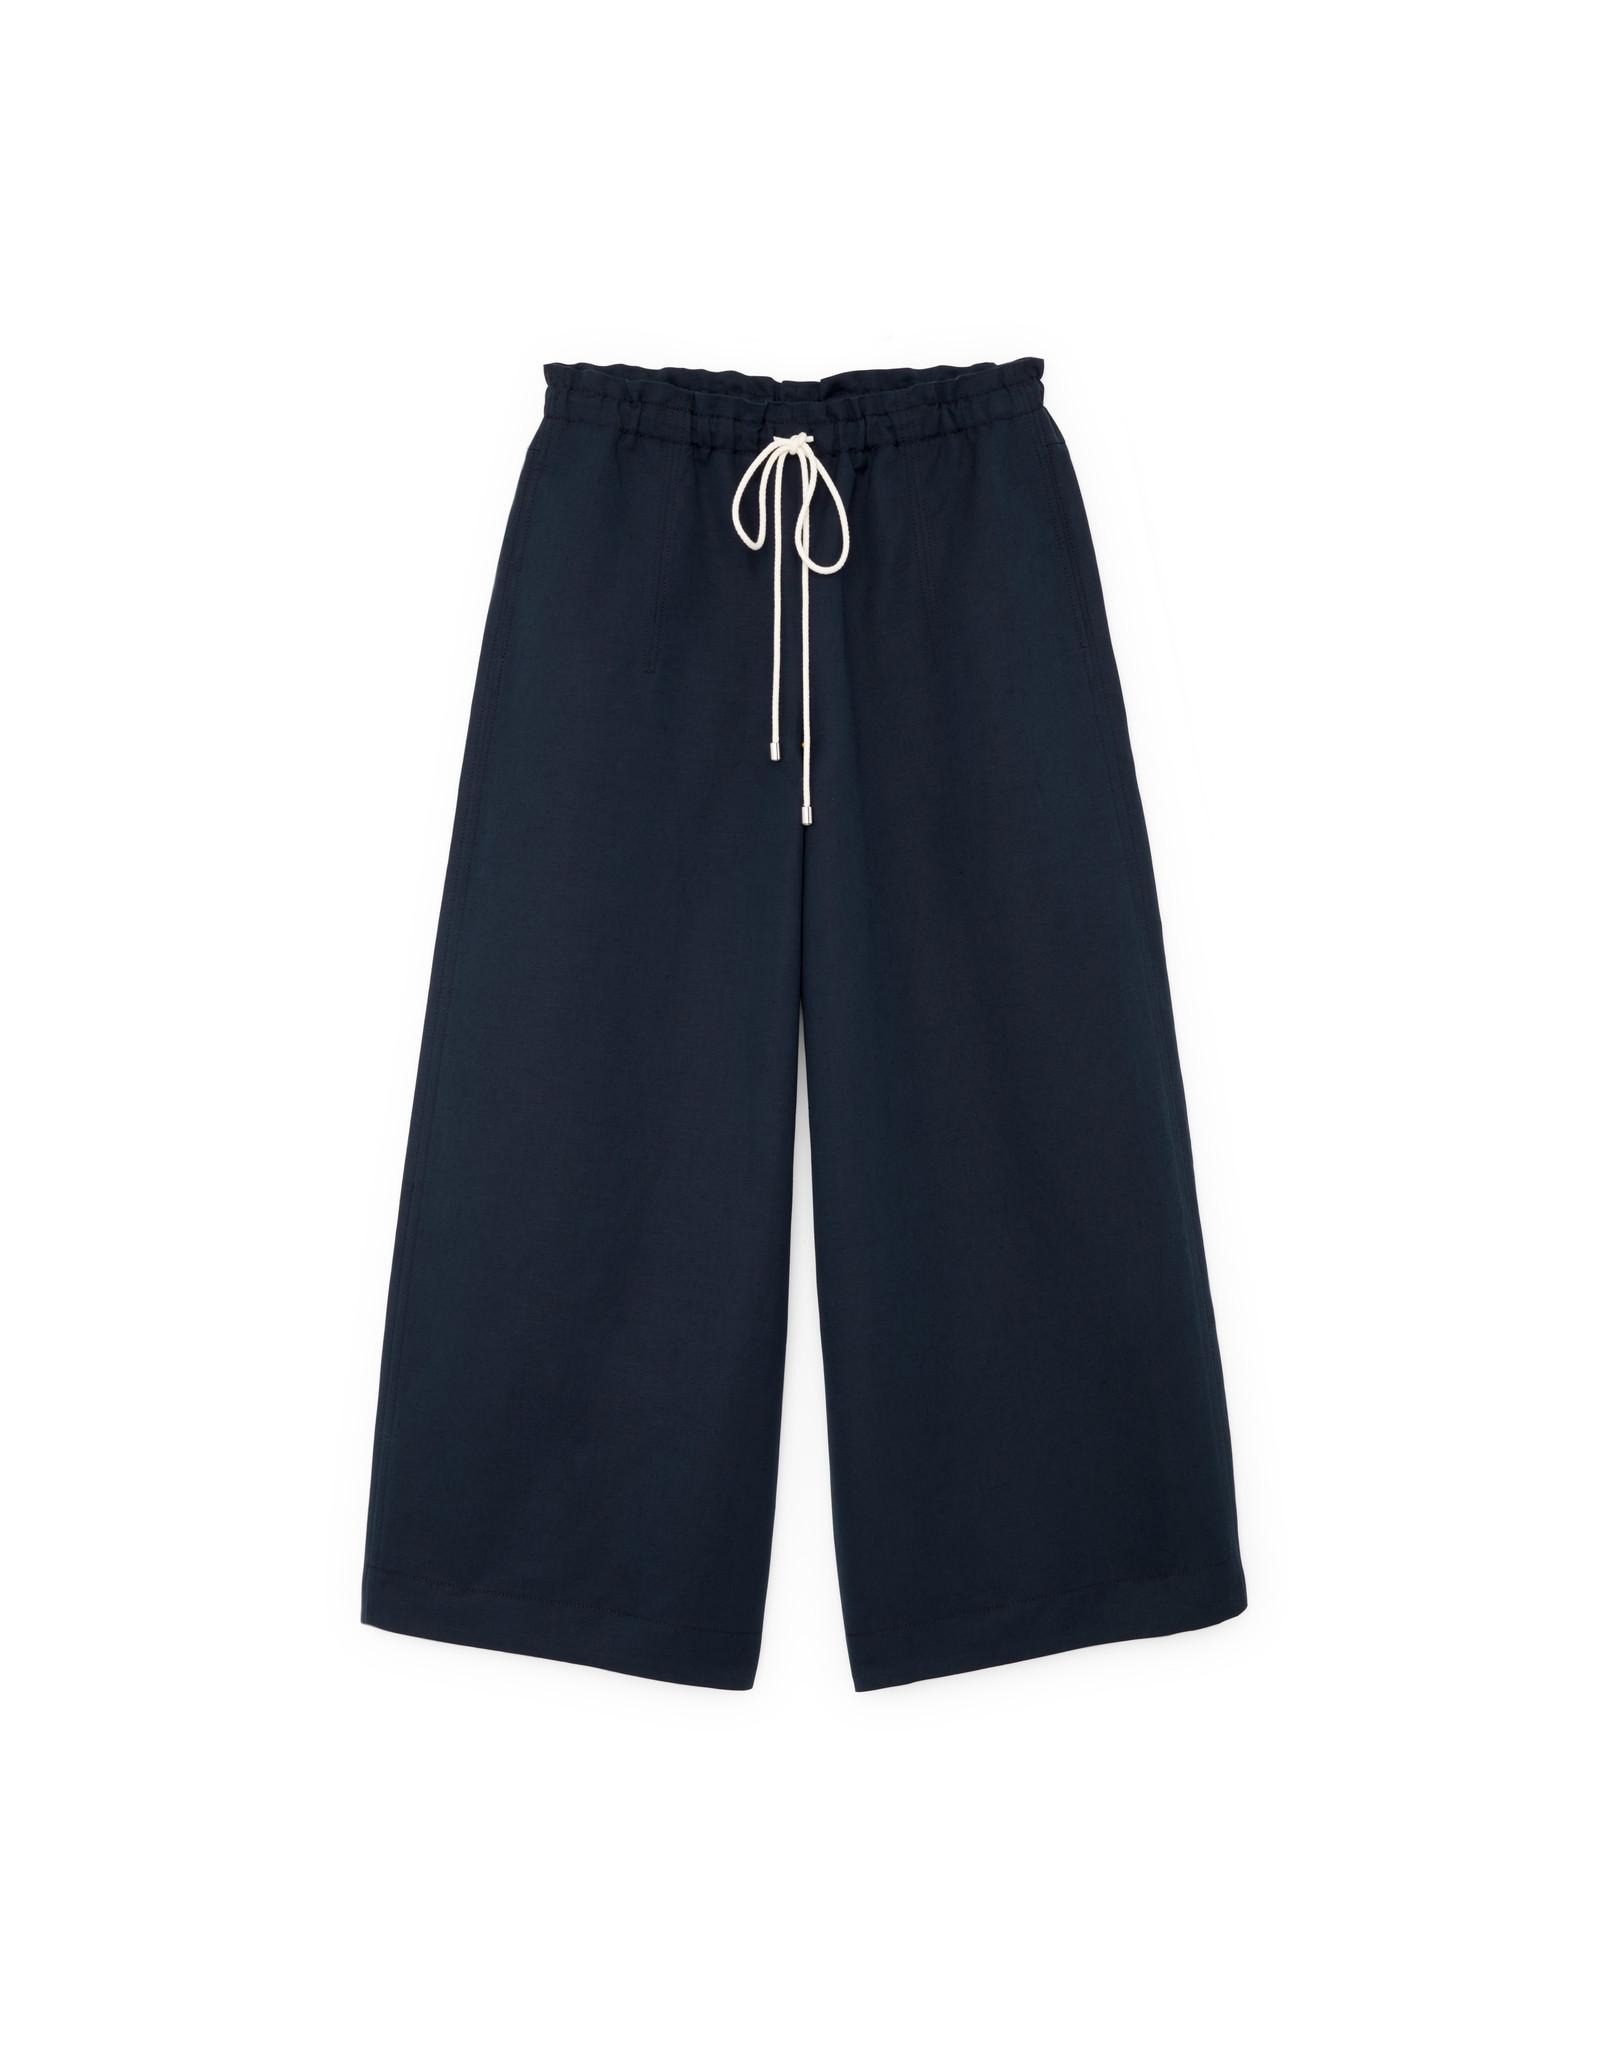 G. Label G. Label Dani Wide Leg Drawstring Pant (Color: Navy, Size: 2)